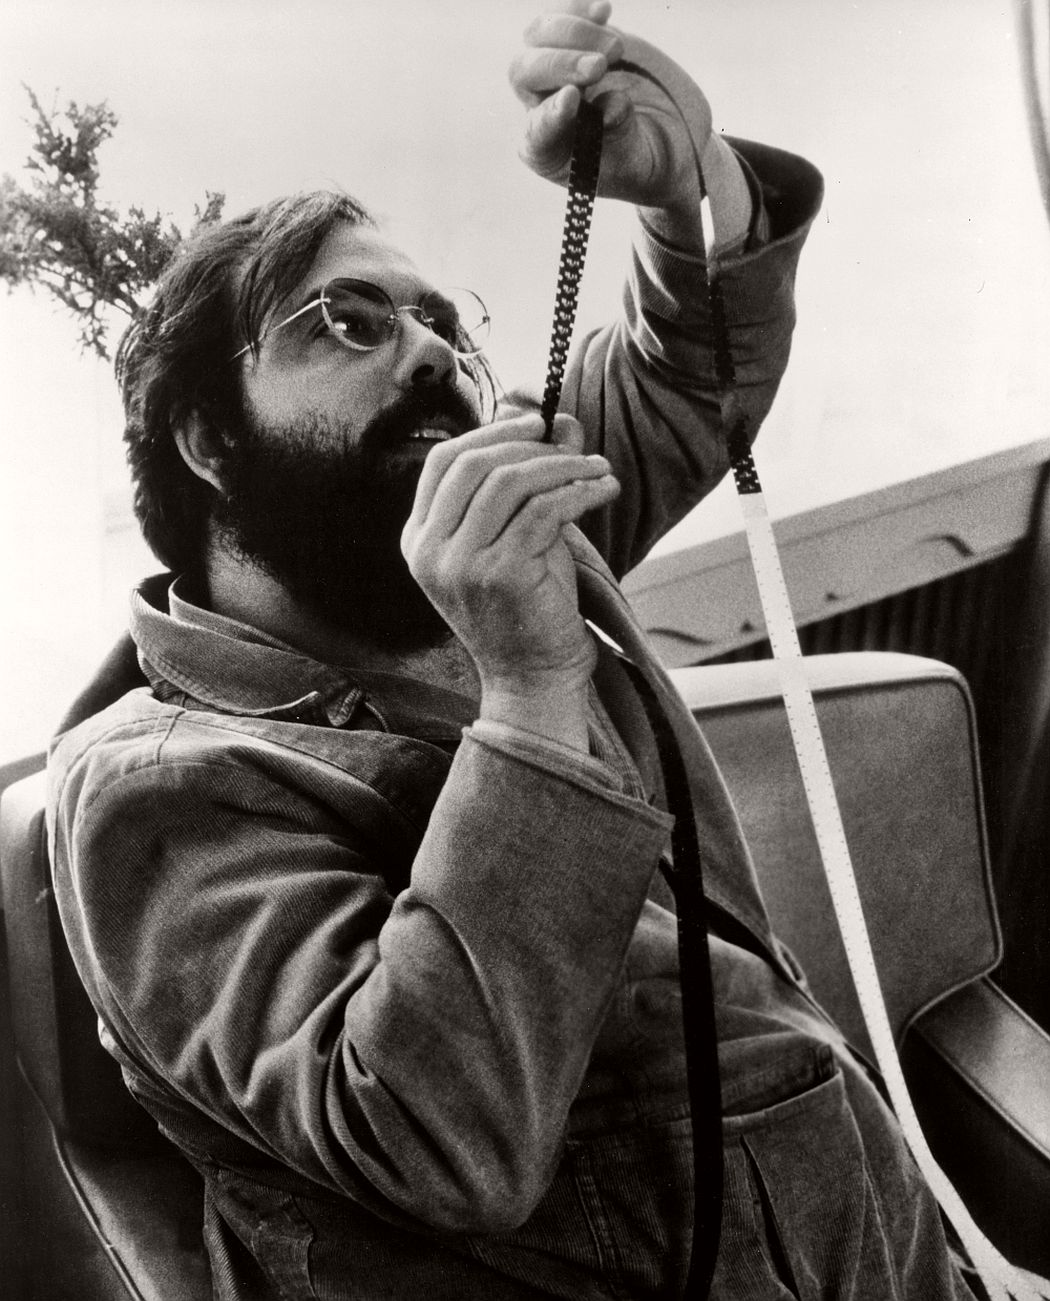 the-godfather-1972-behind-the-scenes-francis-ford-coppola-marlon-brando-al-pacino-55